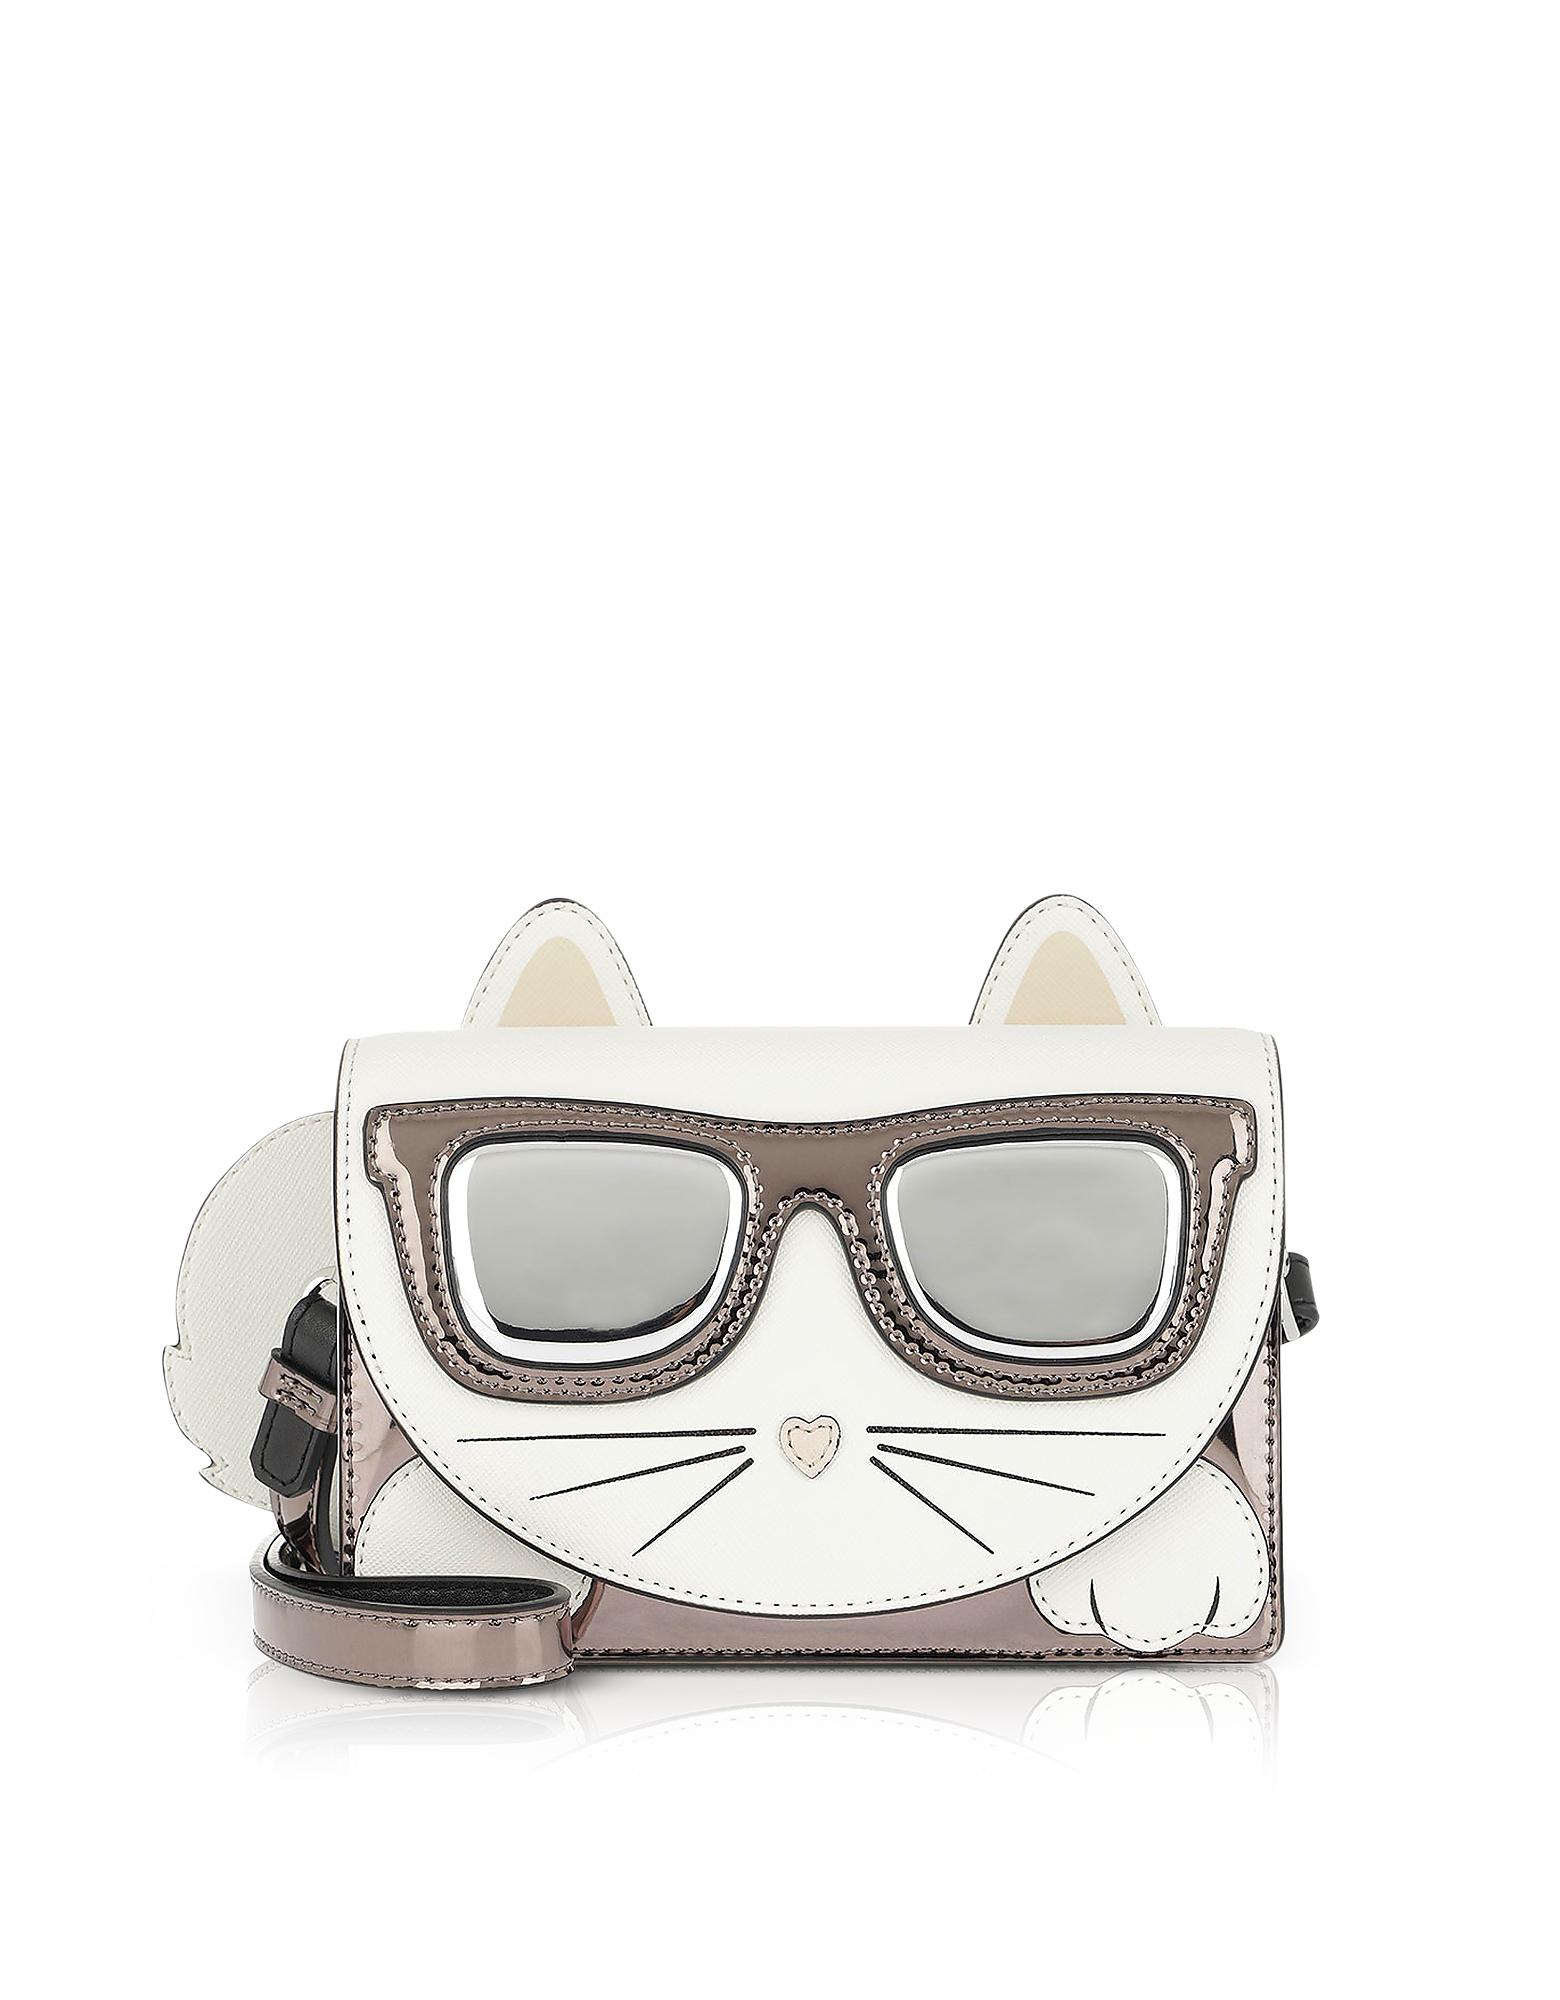 Karl Lagerfeld Handbags, K/Ikonik Choupette Crossbody